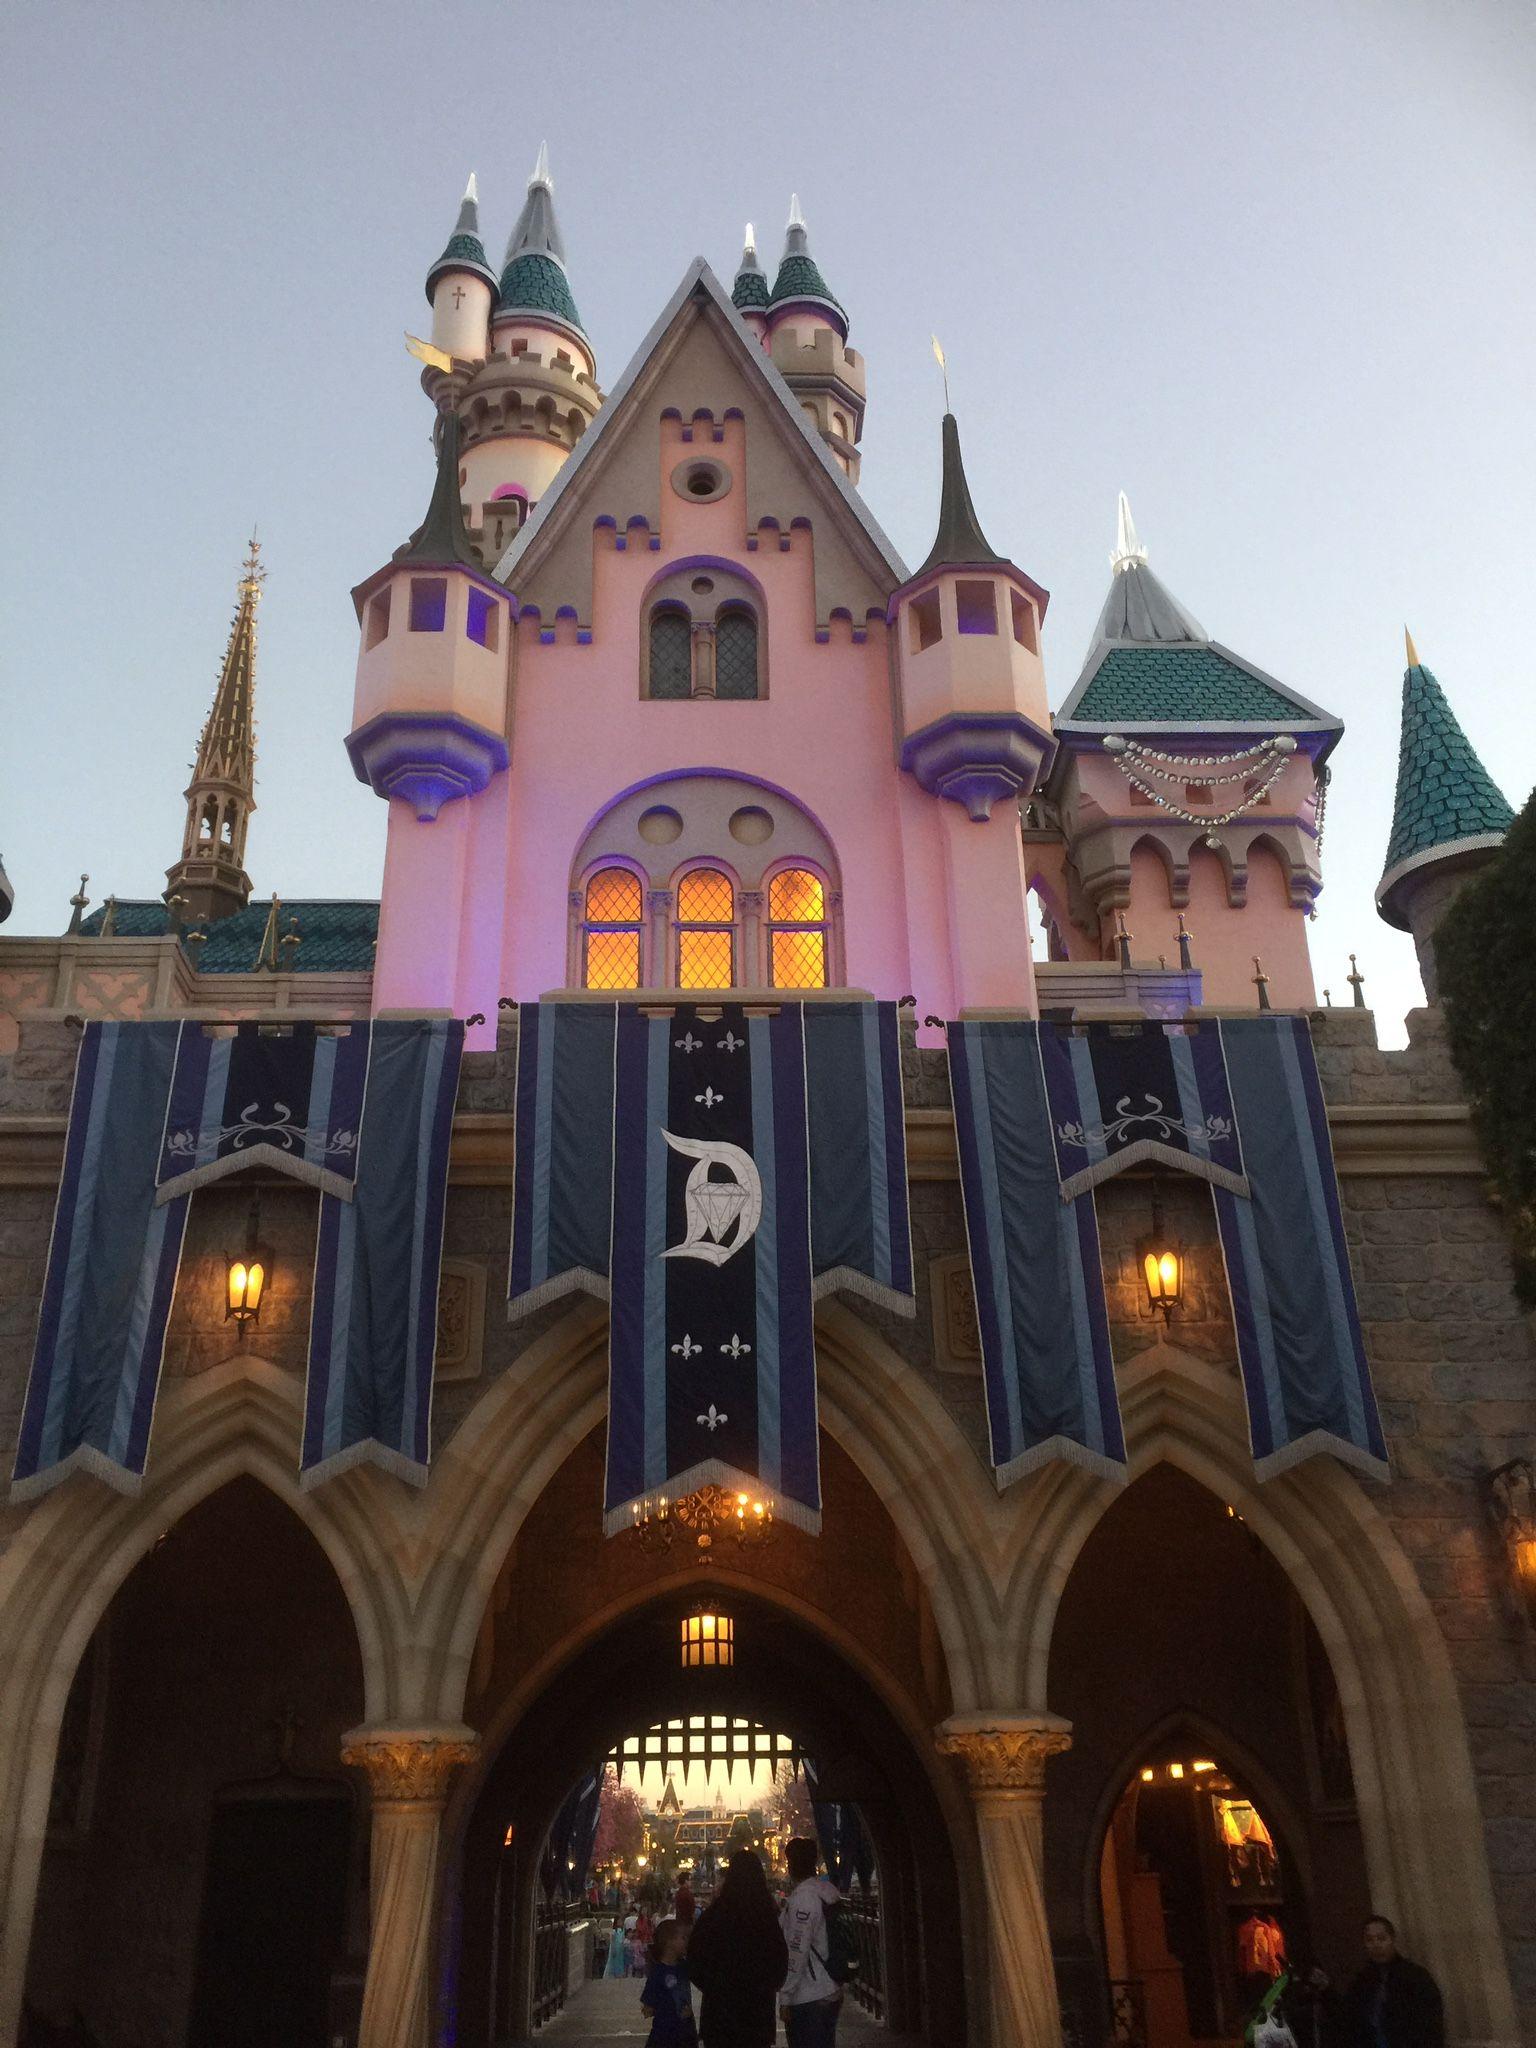 Pin By Hilda Morrison On Disneyland What Do I Dream